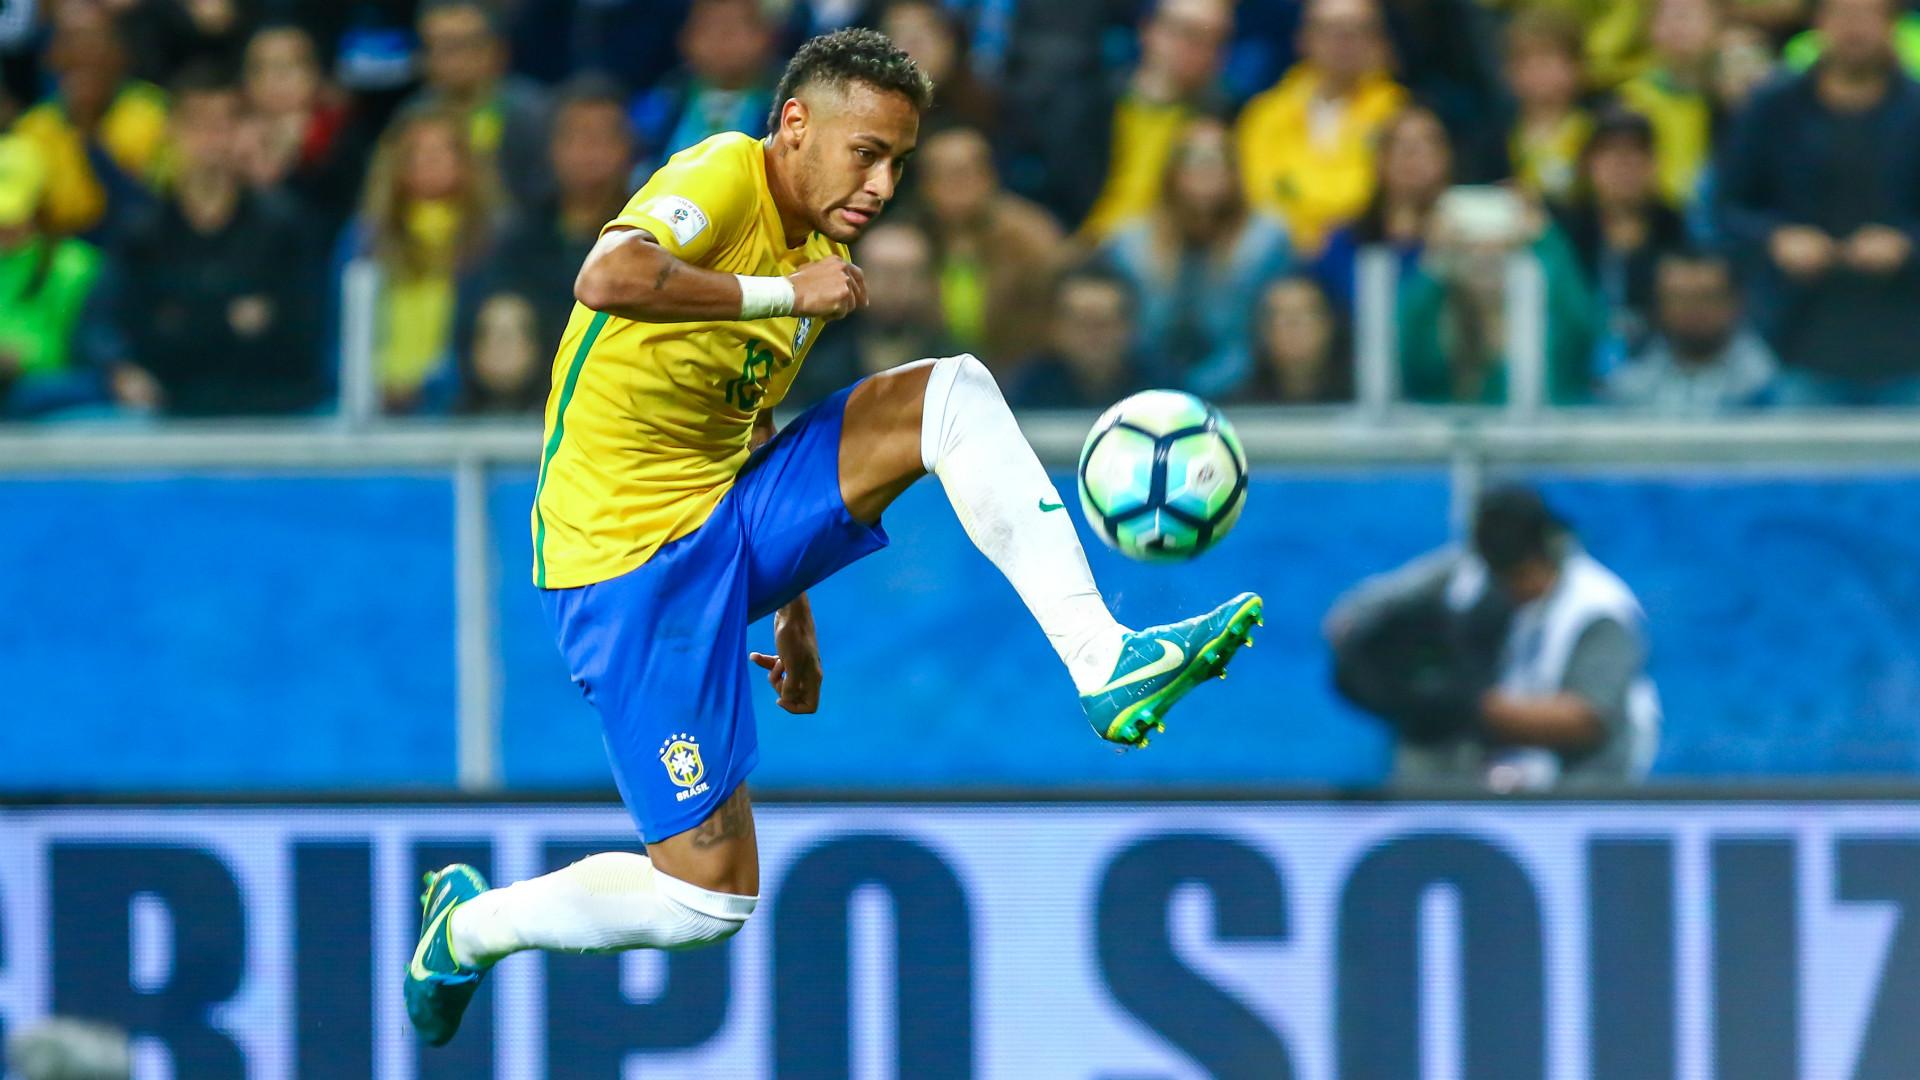 Fantastic Brazil World Cup 2018 - neymar-brazil_1dlodolthvueyz8ygcxoy3tk8  Pic_671084 .jpg?t\u003d1383246622